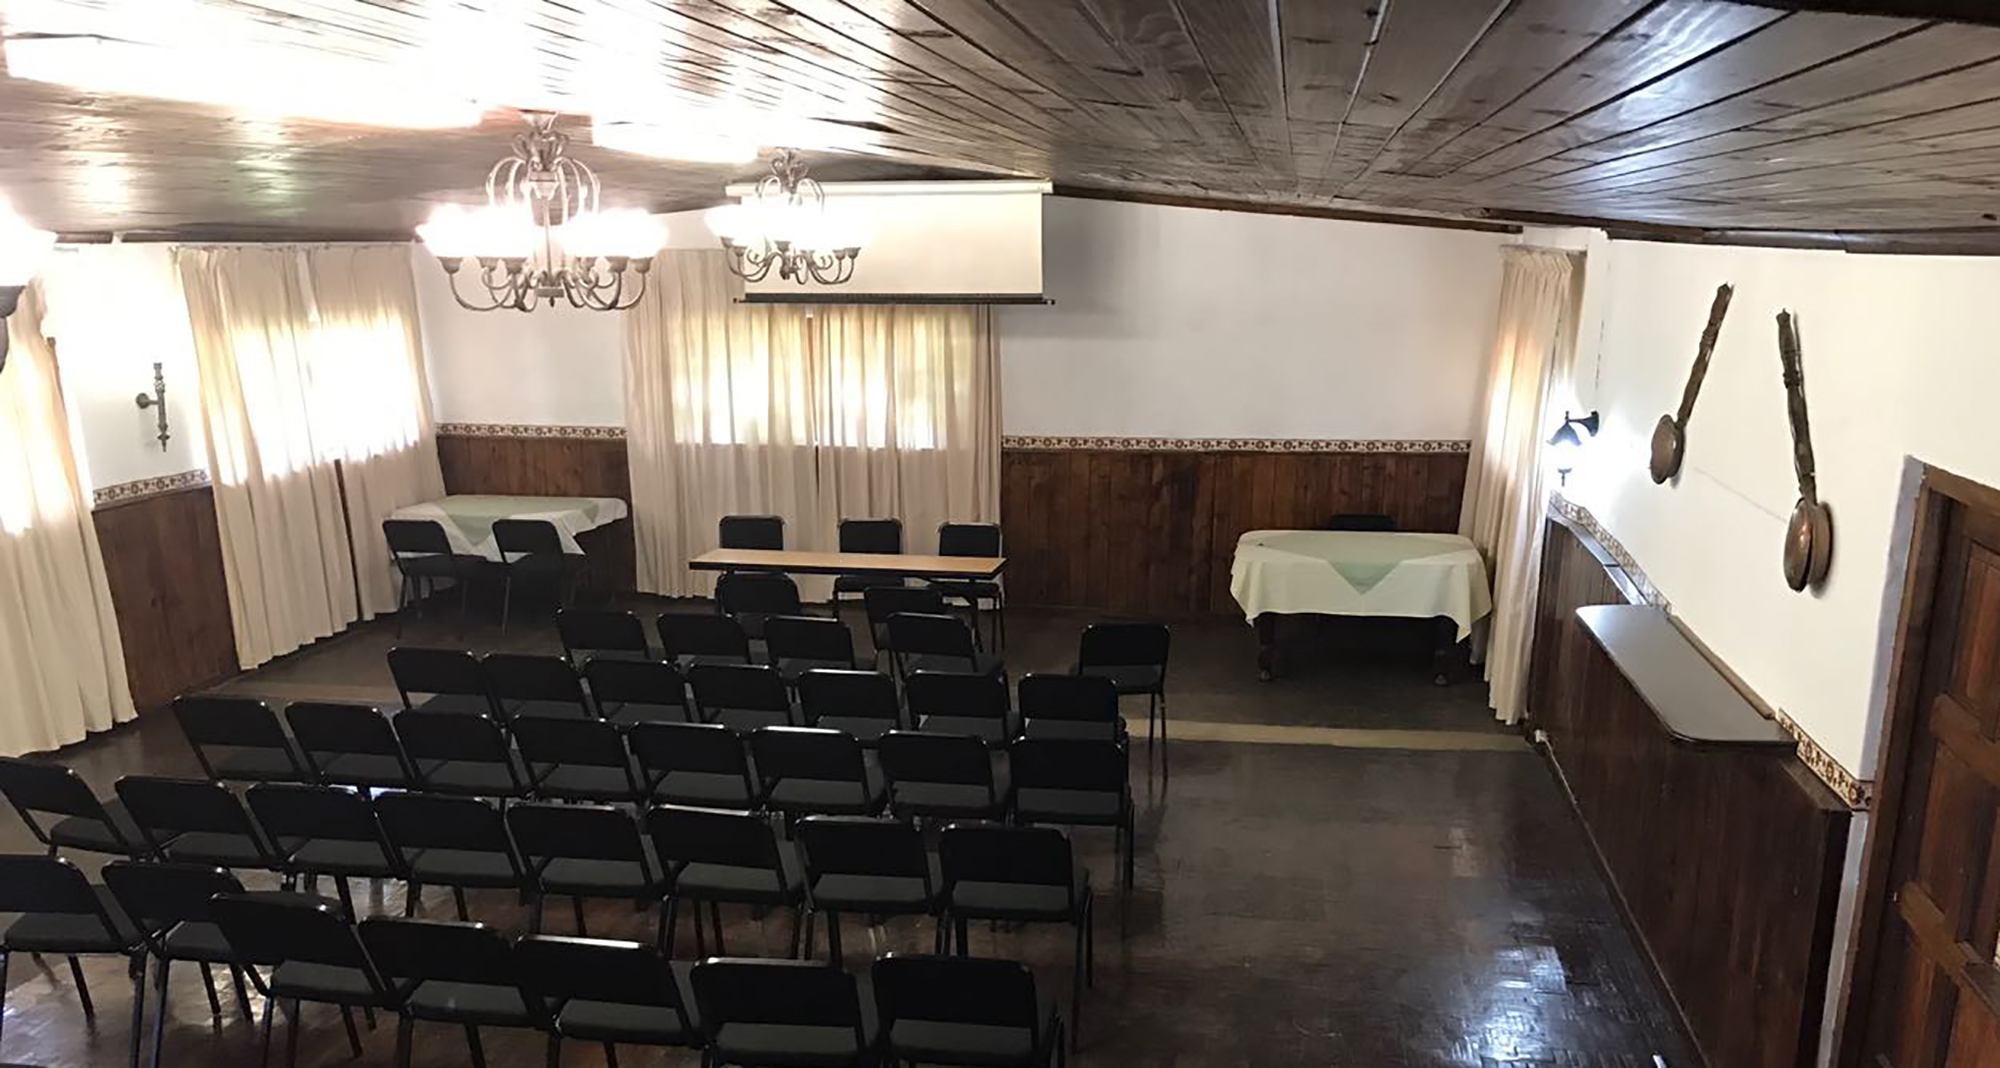 Premier Hotel Himeville Arms (Southern Drakensberg)